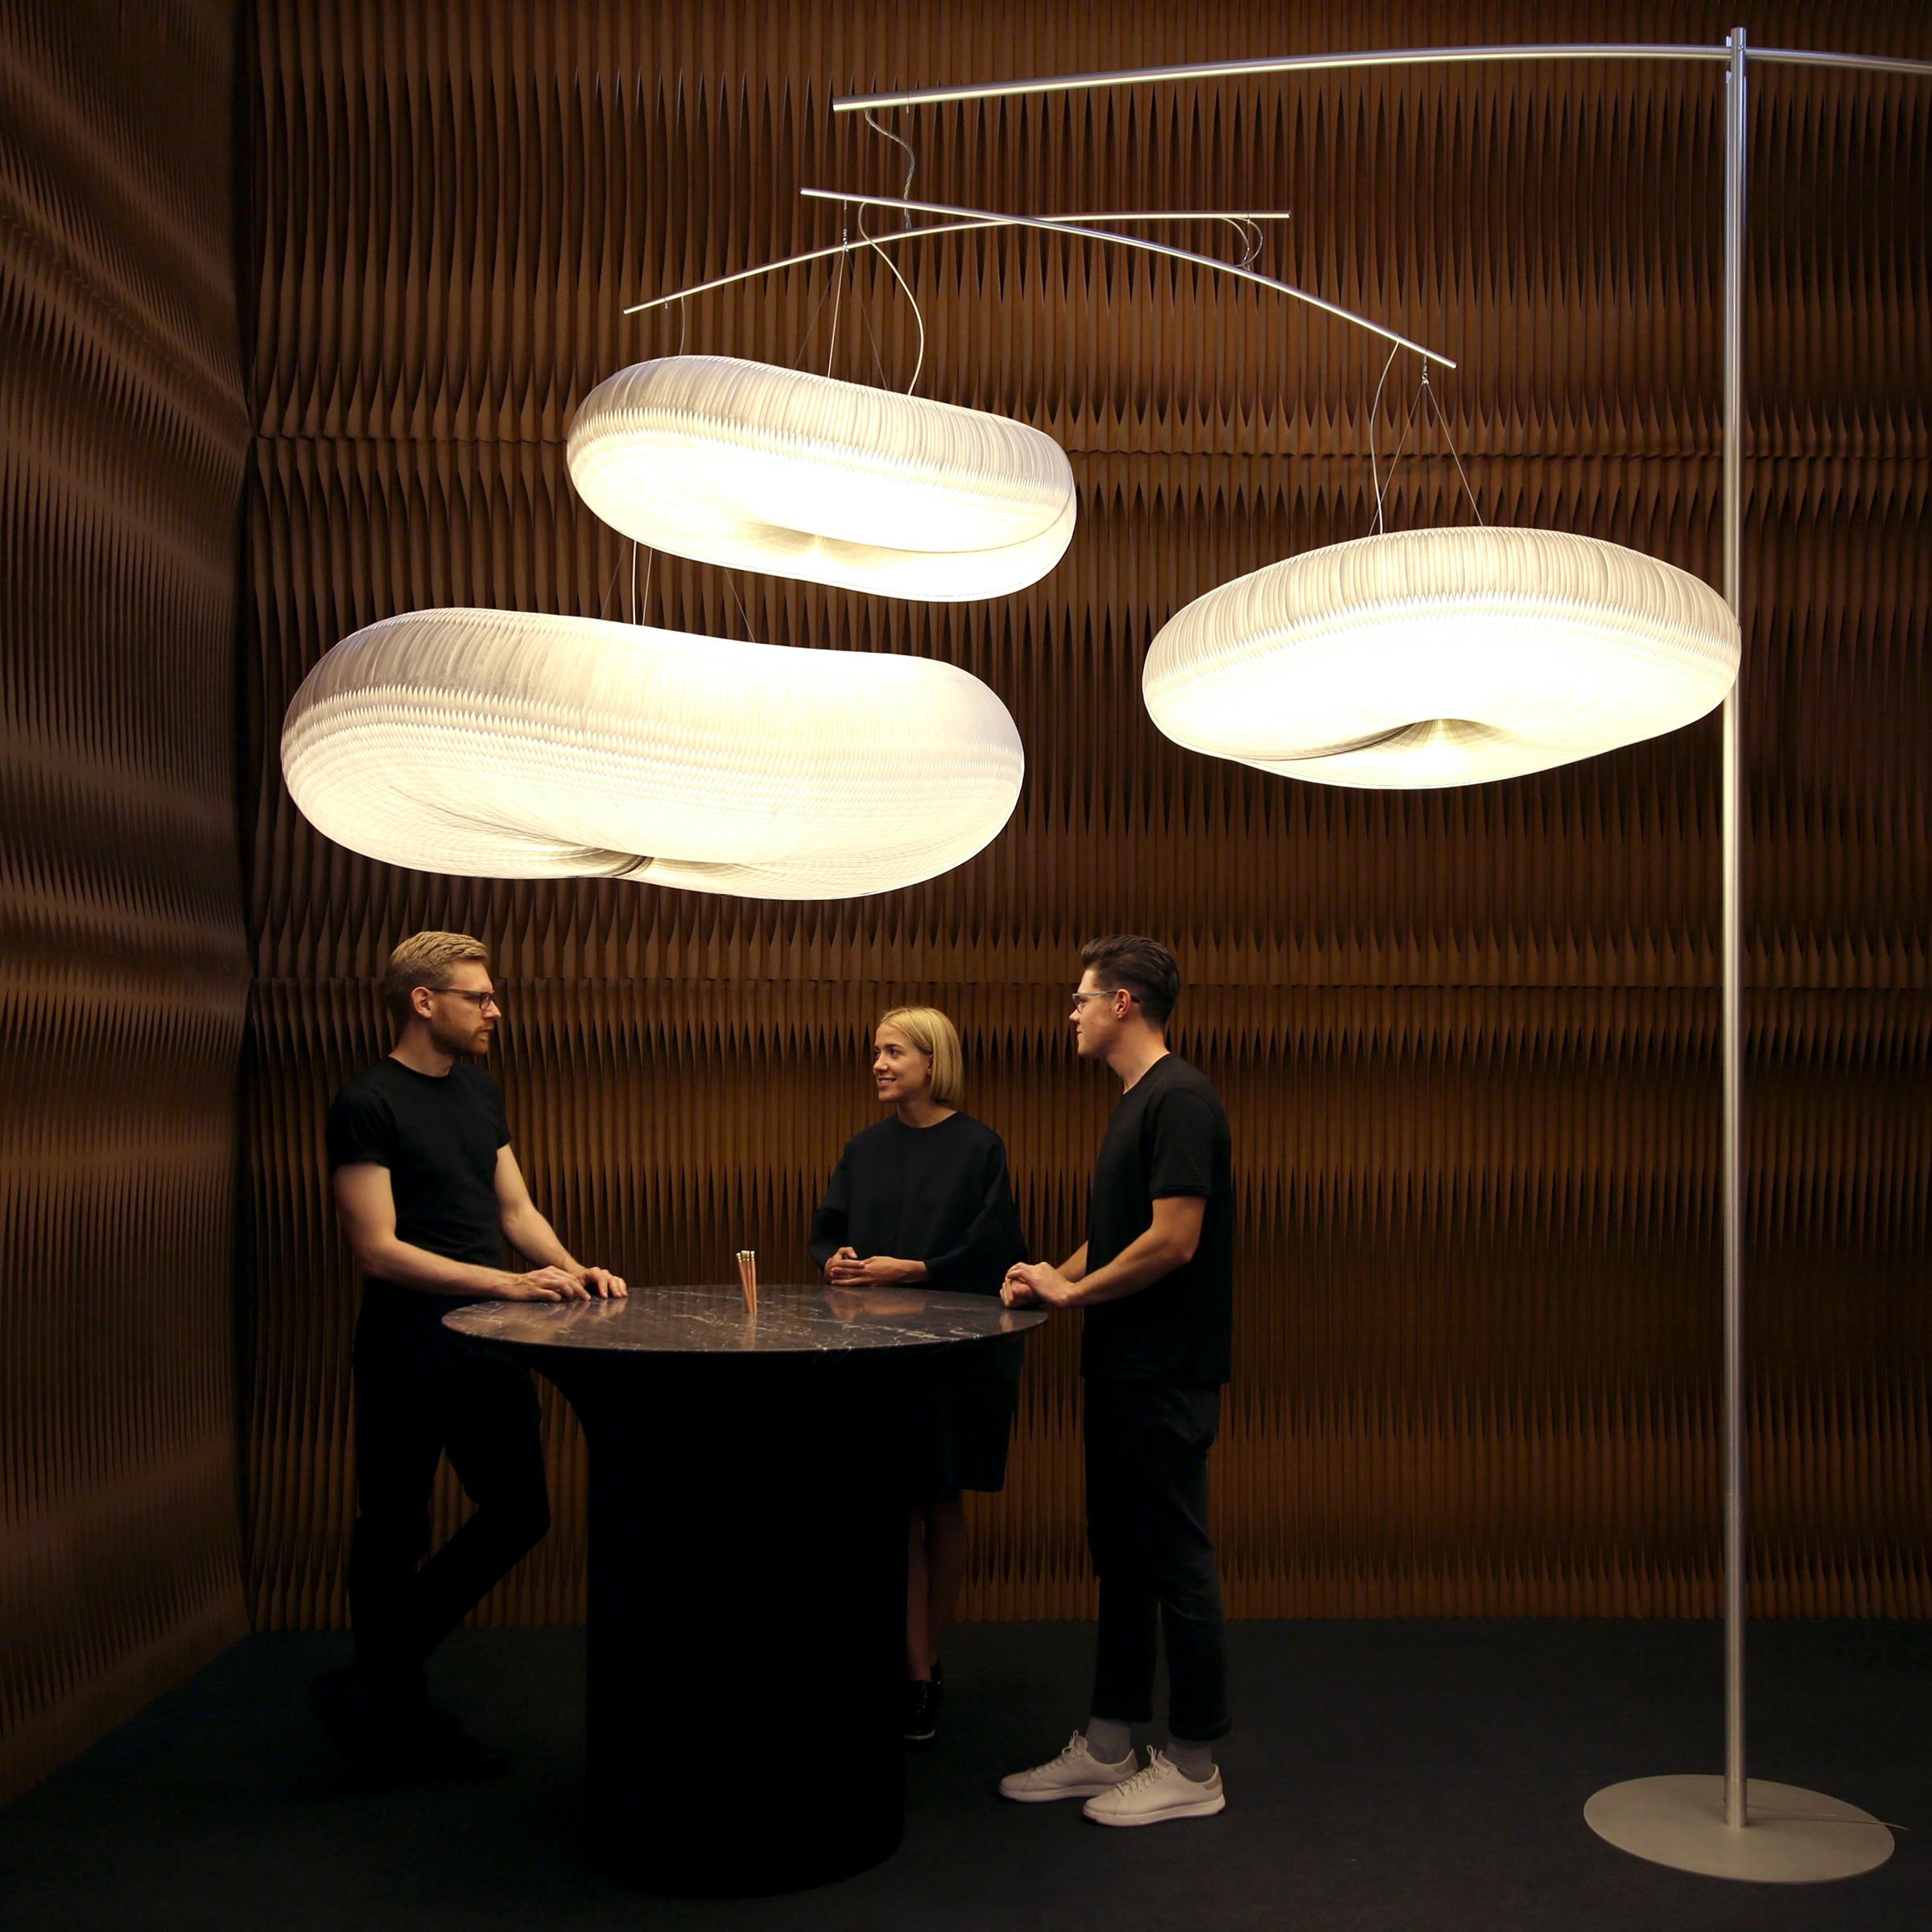 new cloud trubridge david light account medium to ceiling pendant electricguru create